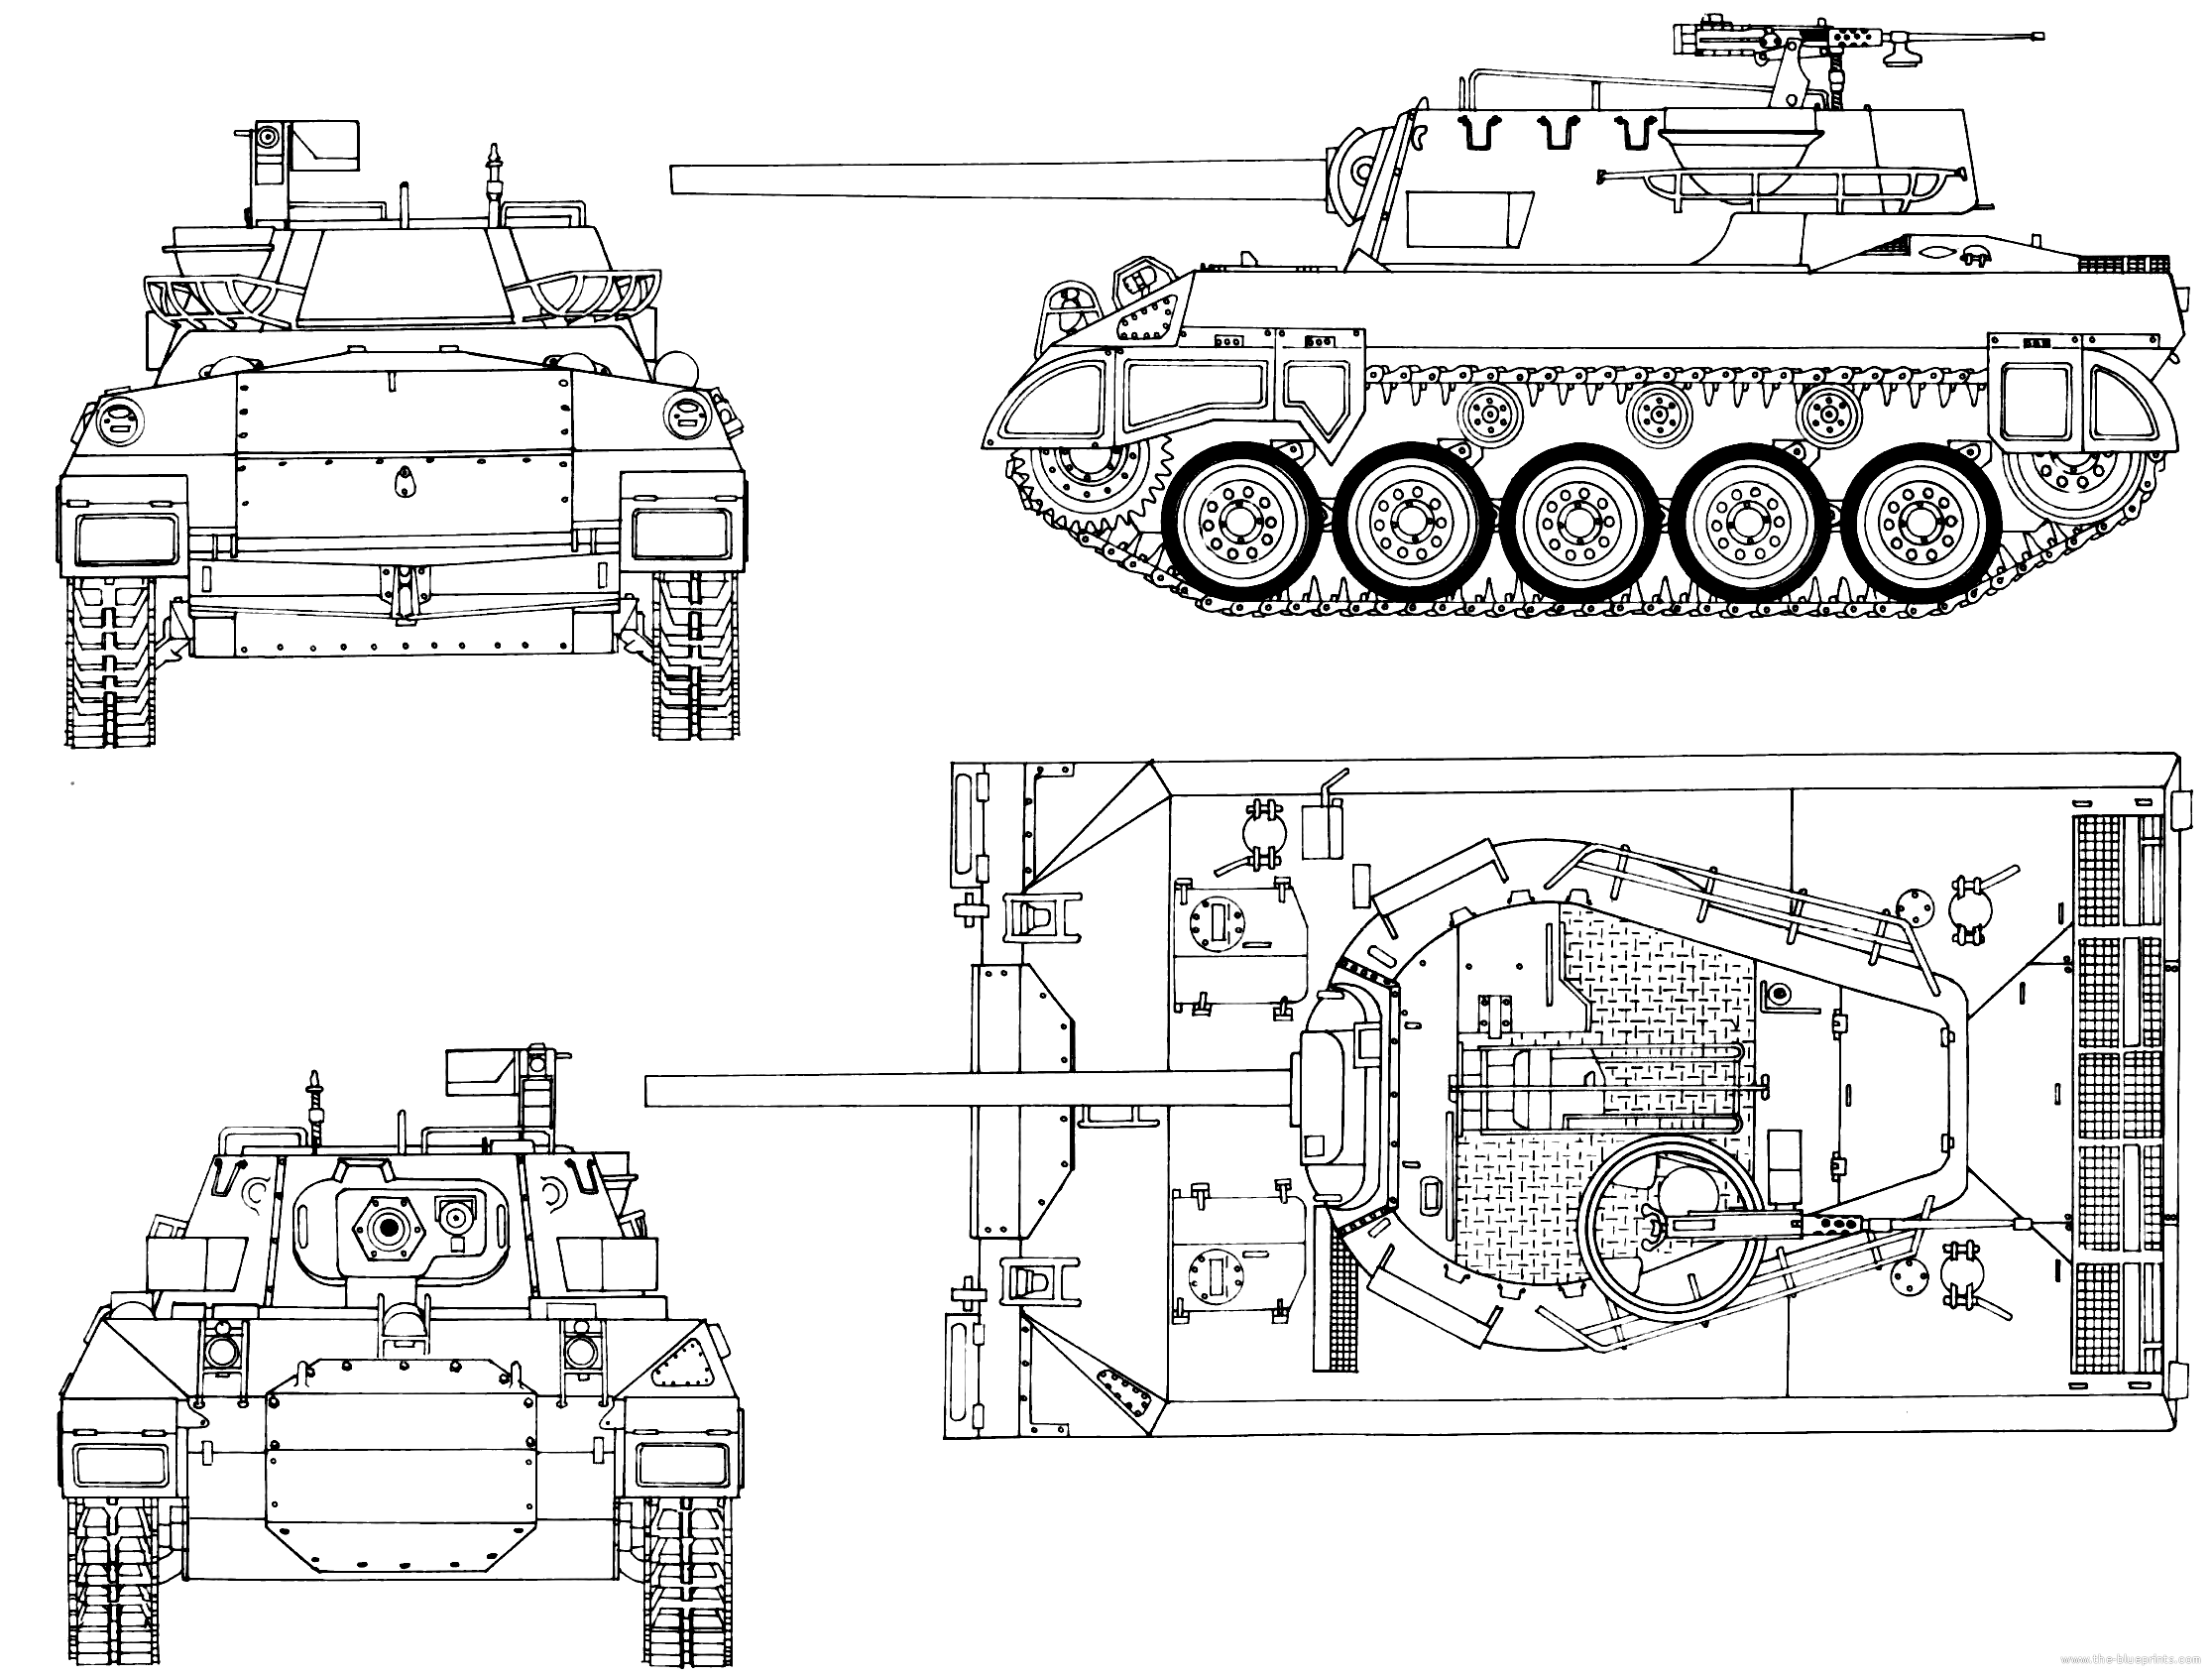 M18 Hellcat 76mm Gun Motor Carriage